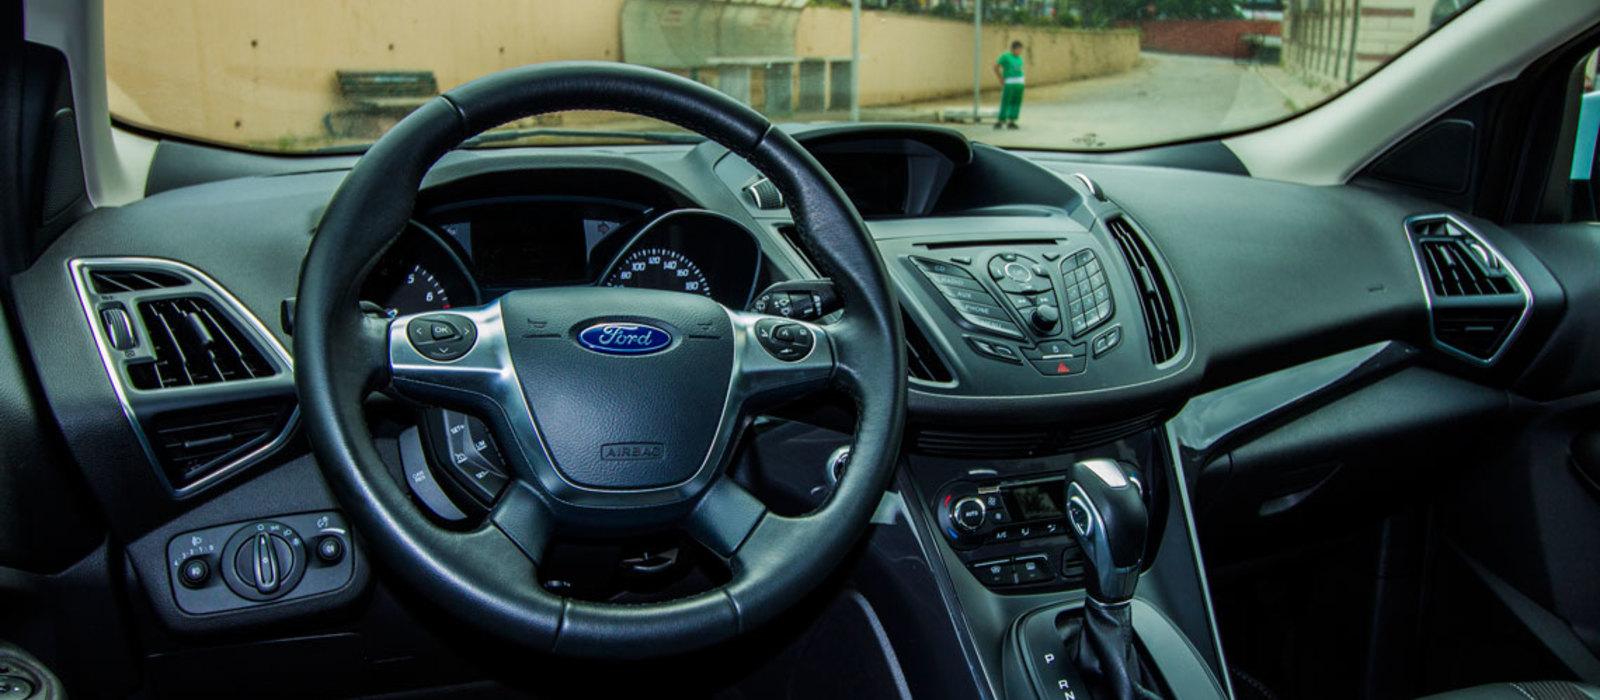 ikinci el araba 2014 Ford Kuga 1.6 EcoBoost Titanium Benzin Otomatik 14000 KM 11